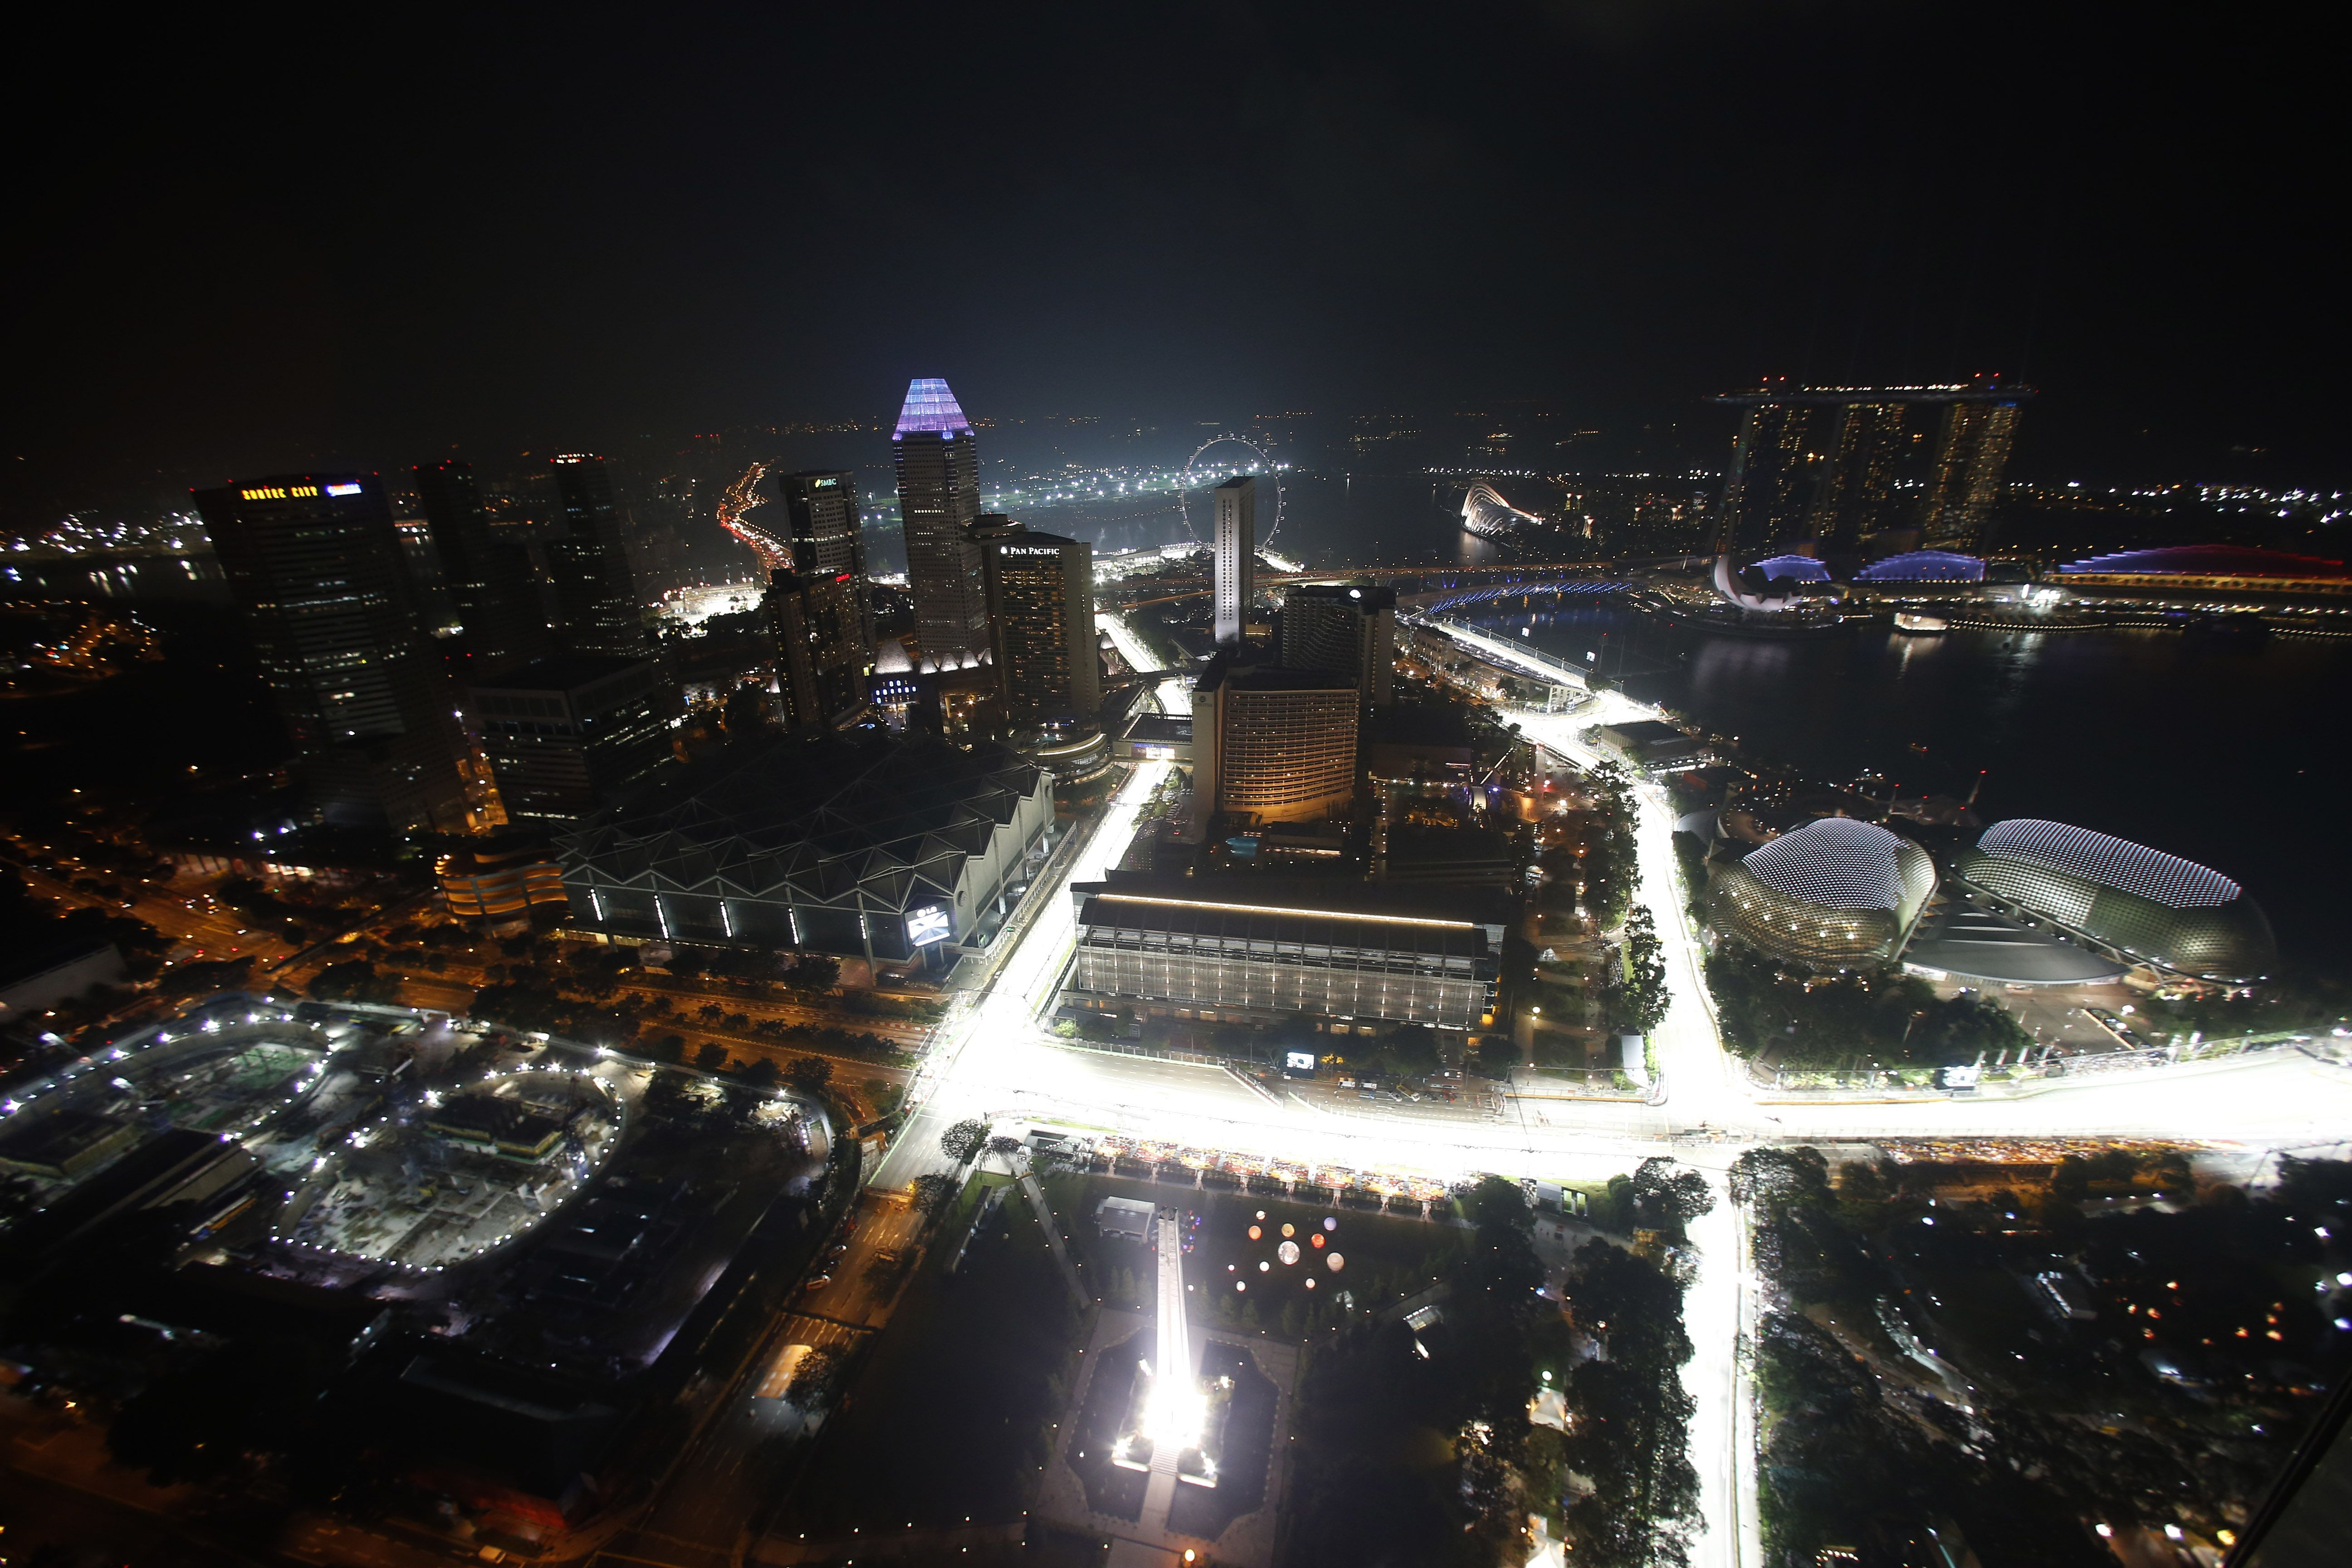 An illuminated bird eye view of the track B